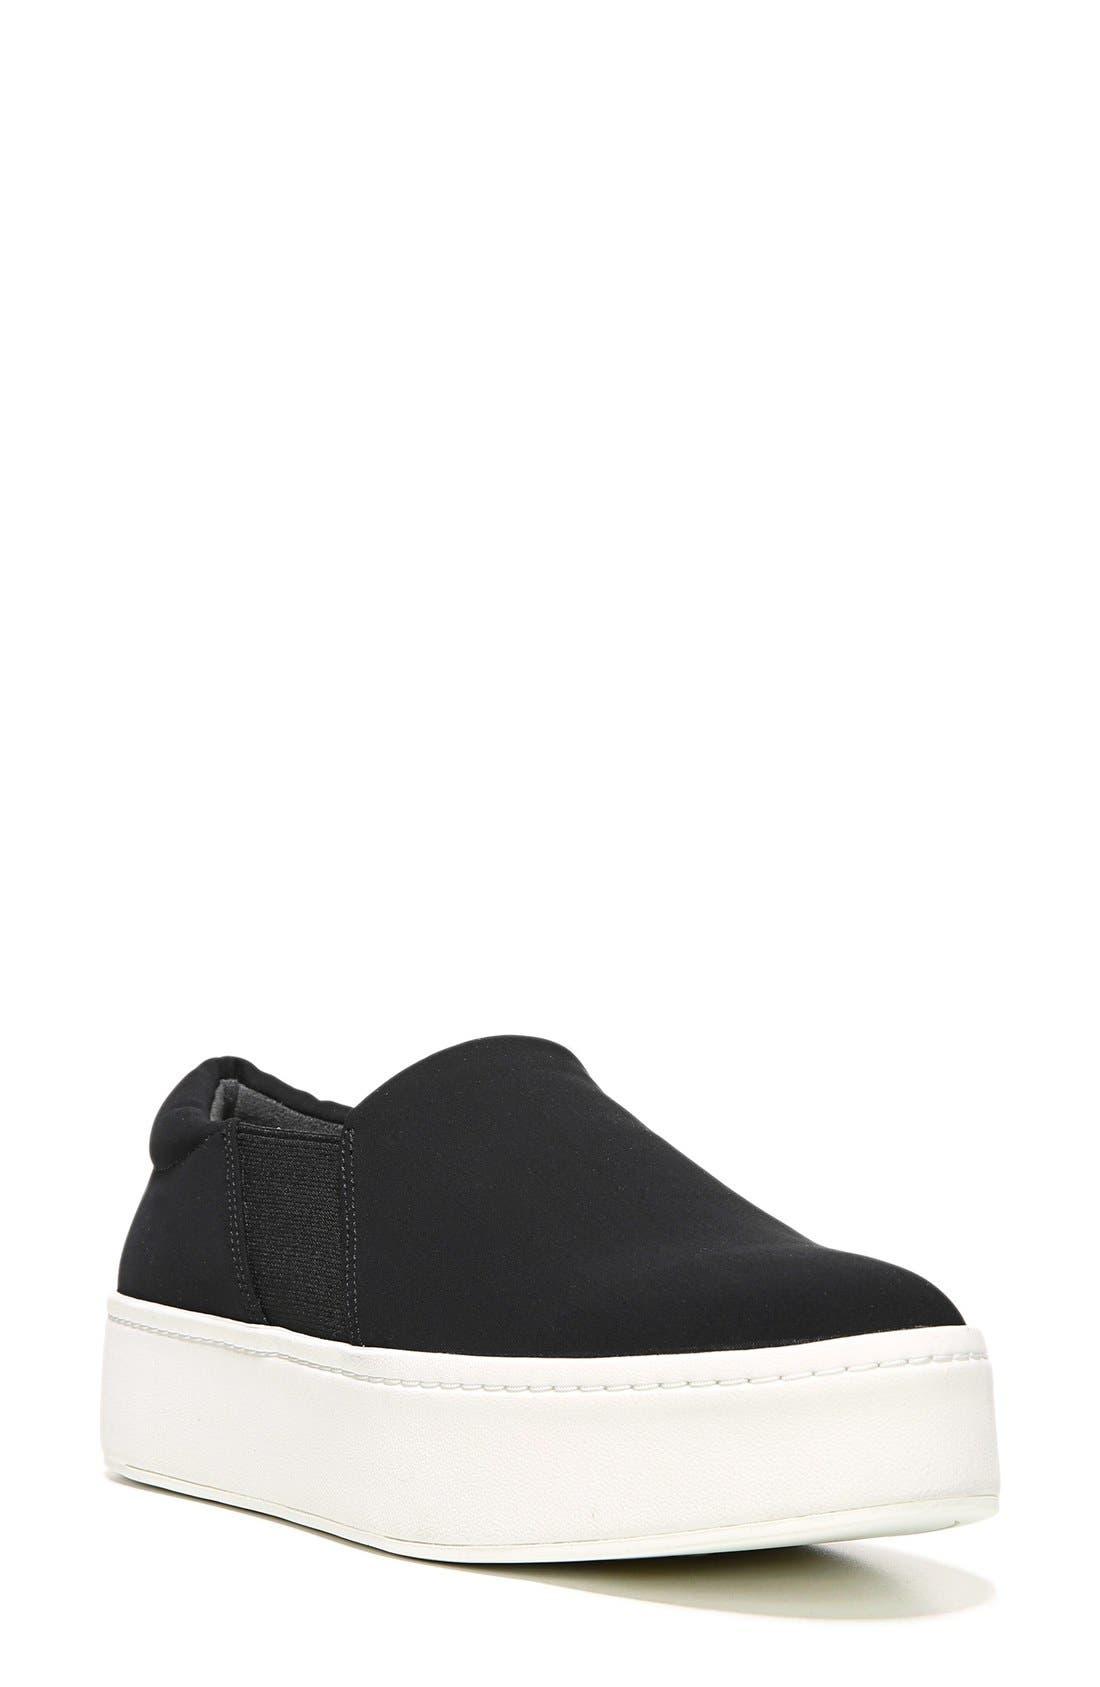 Warren Slip-On Sneaker,                         Main,                         color, Black